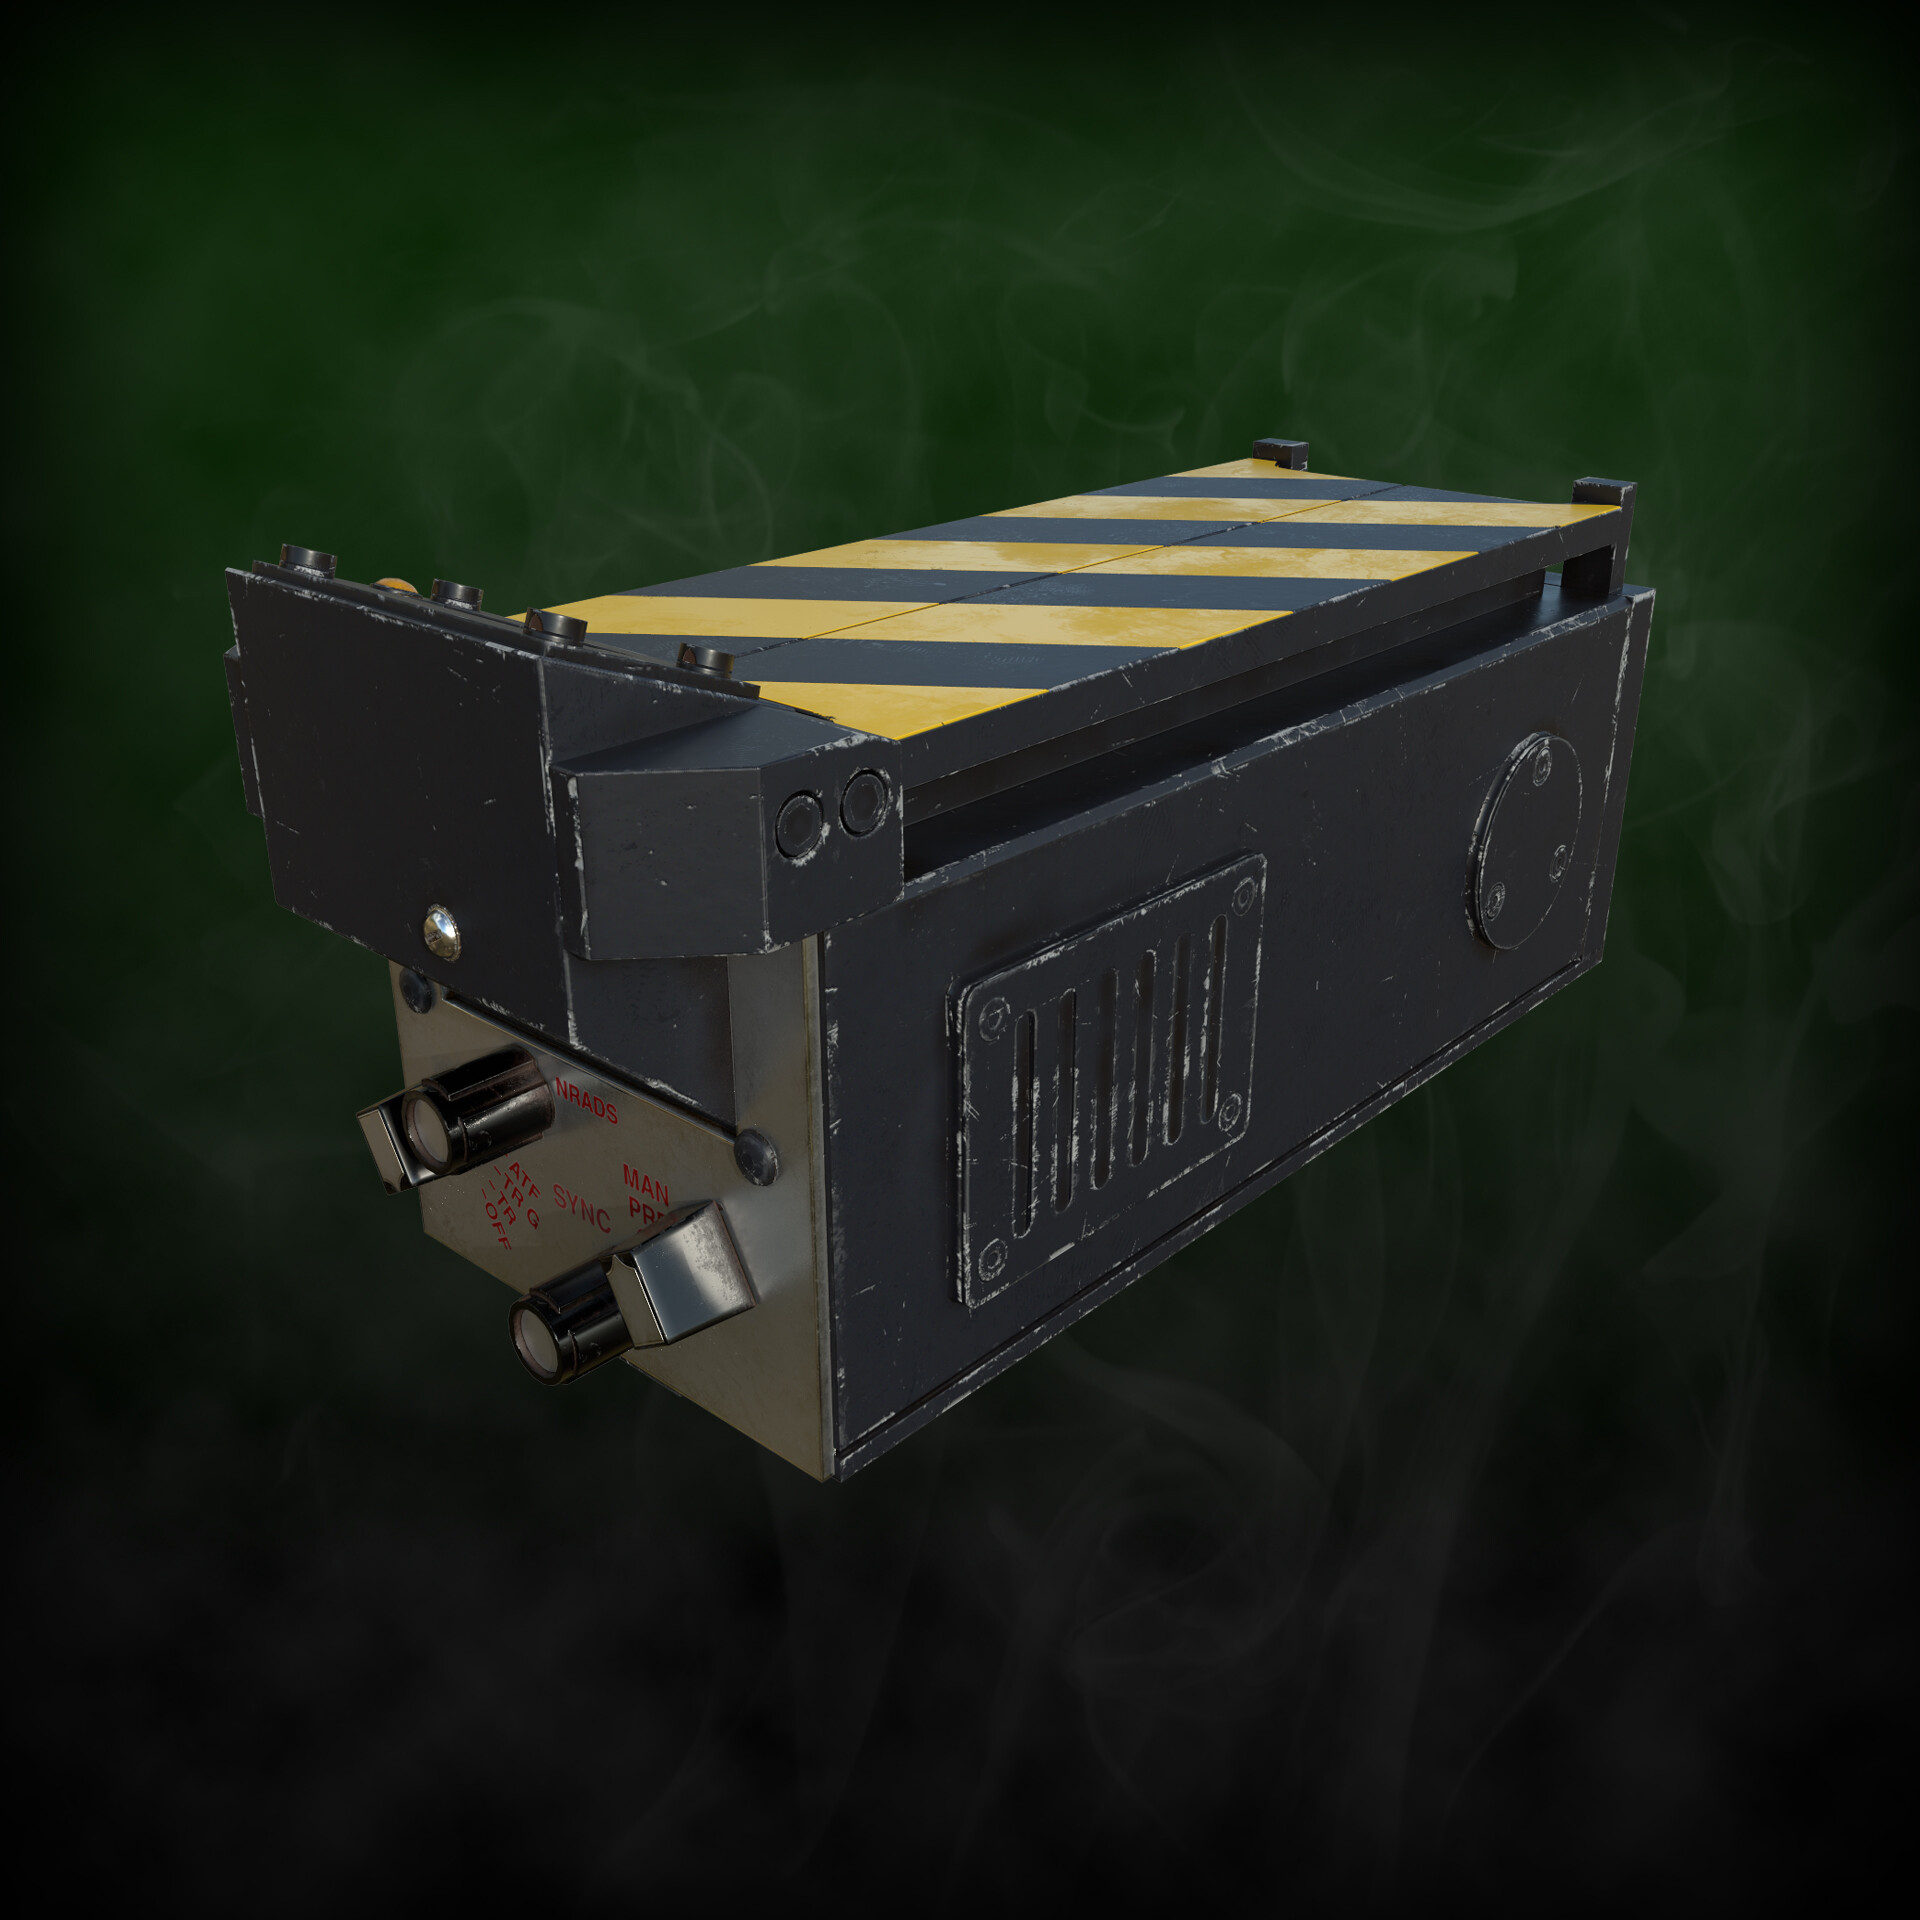 Thomas marrone ghostbusters trap wip 2019 07 14 04